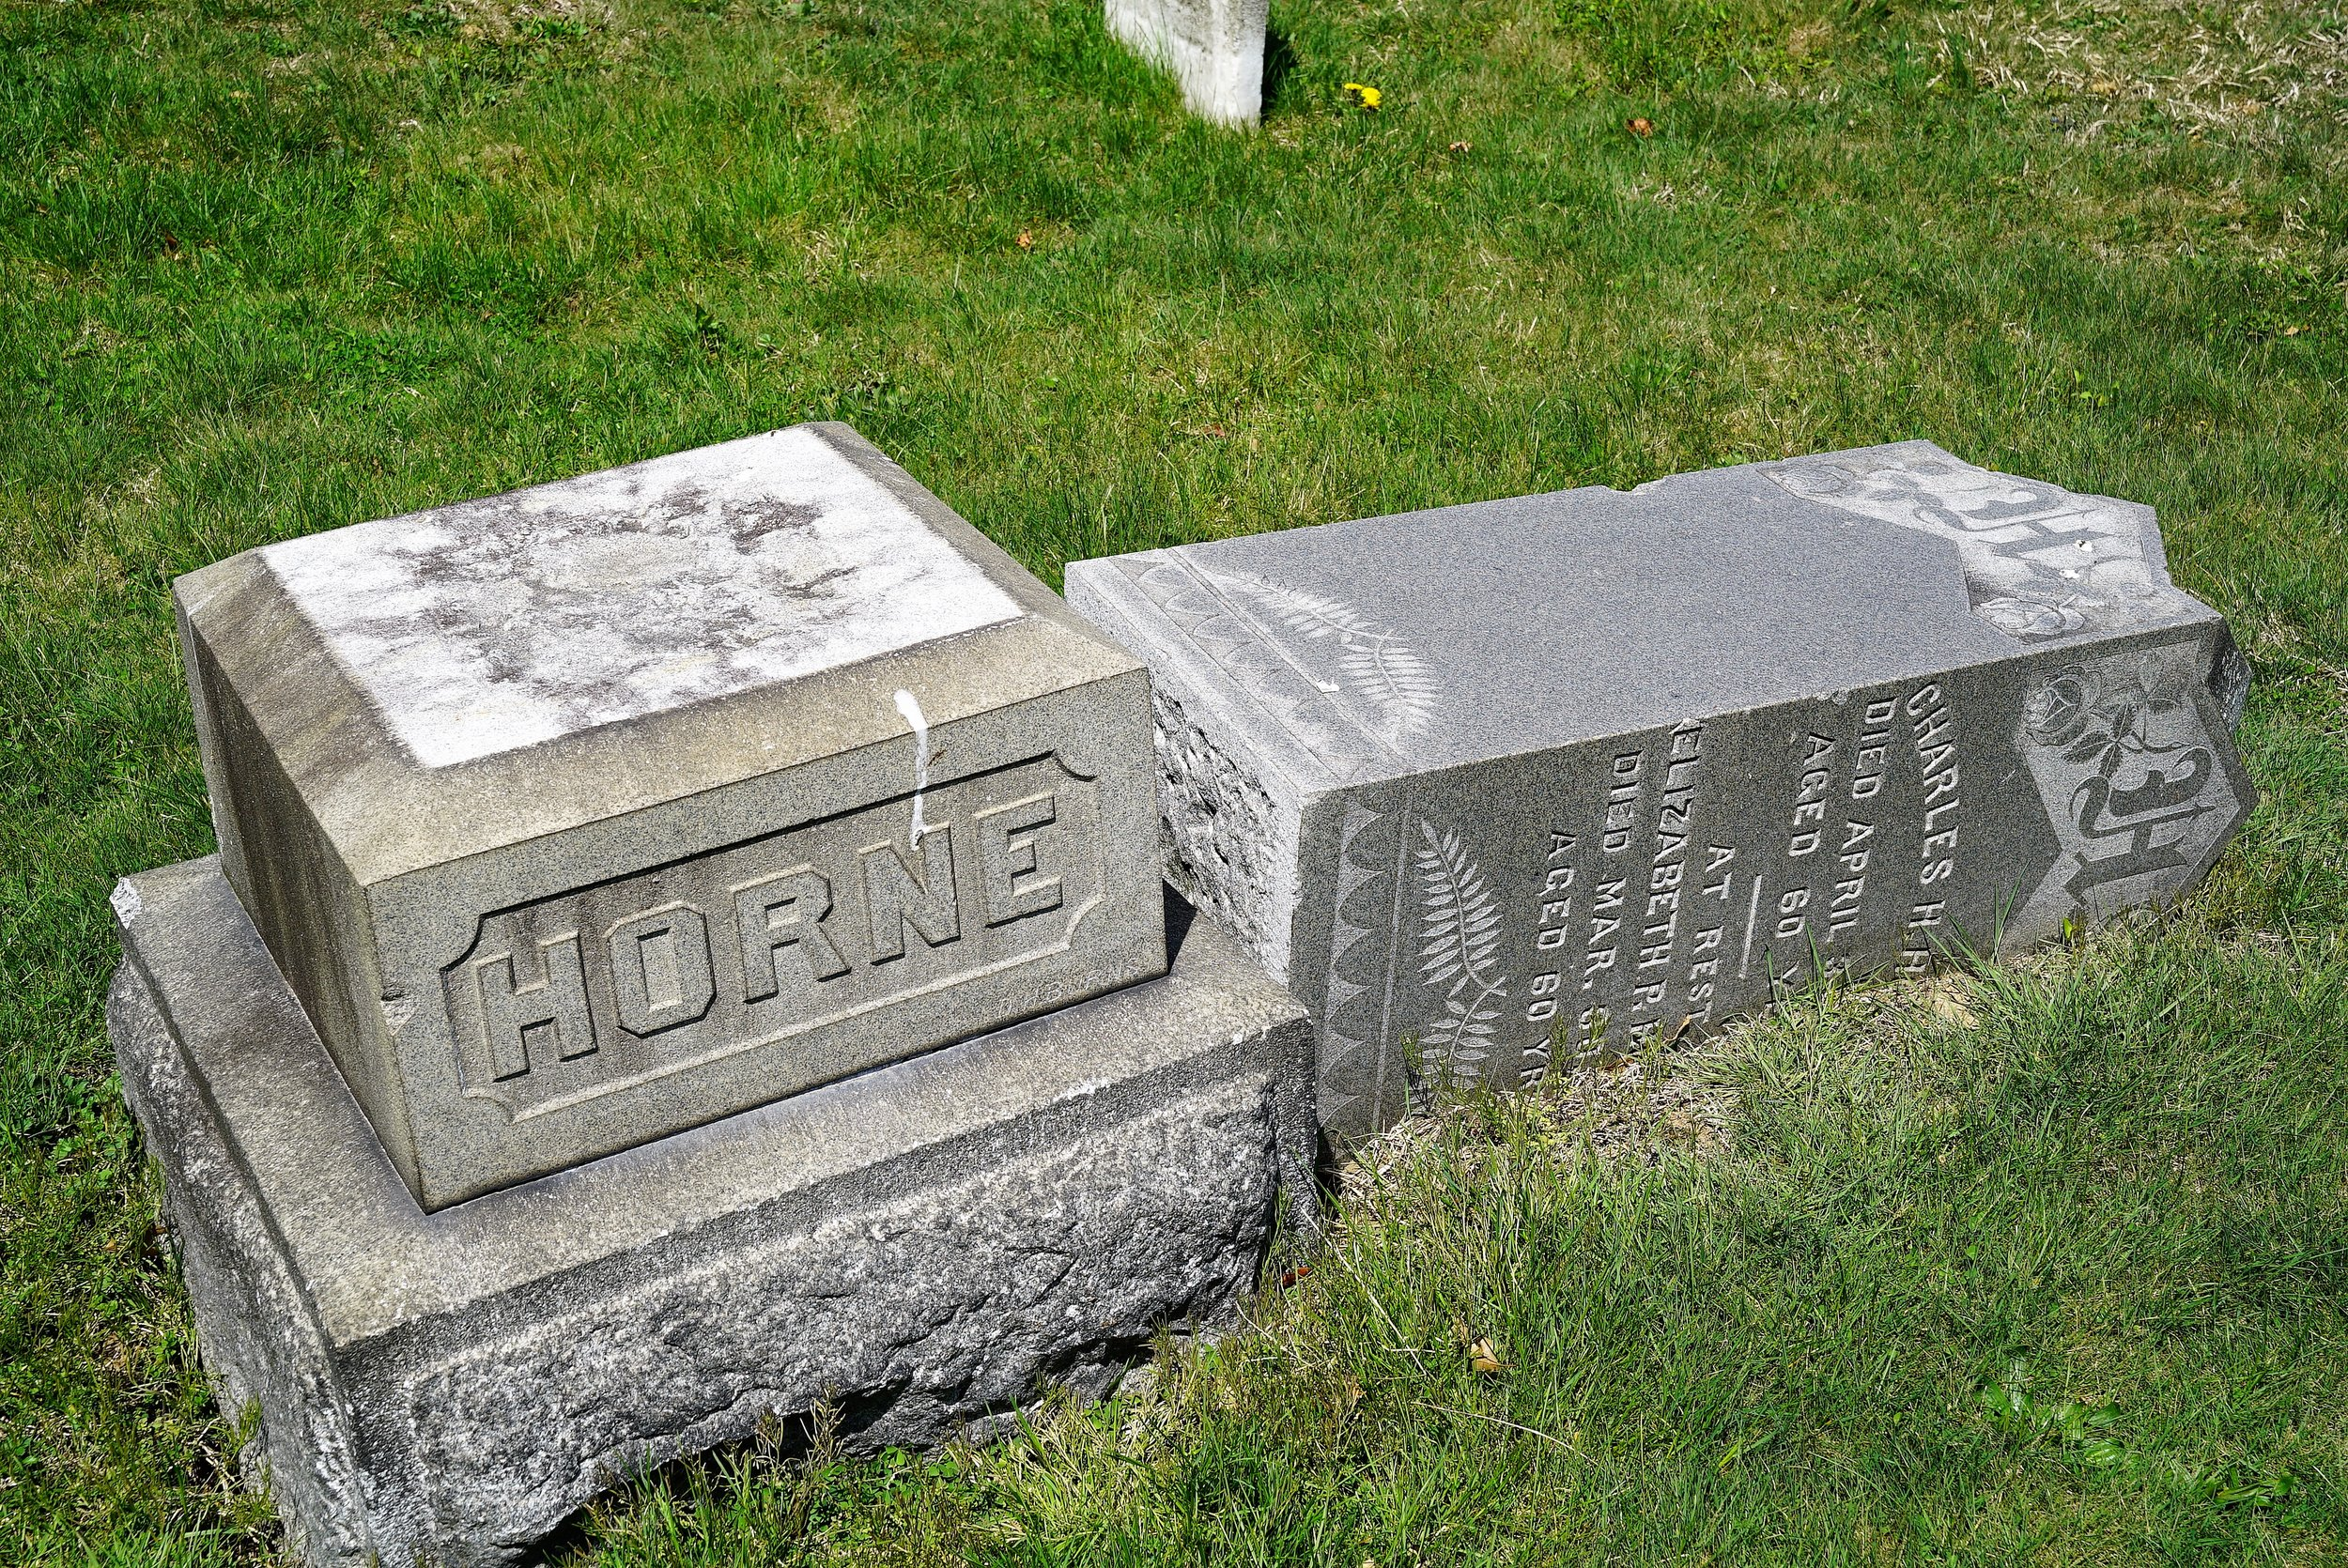 A monument waiting for help. Prospect Hill Baptist Church Cemetery. Prospect Park, PA.